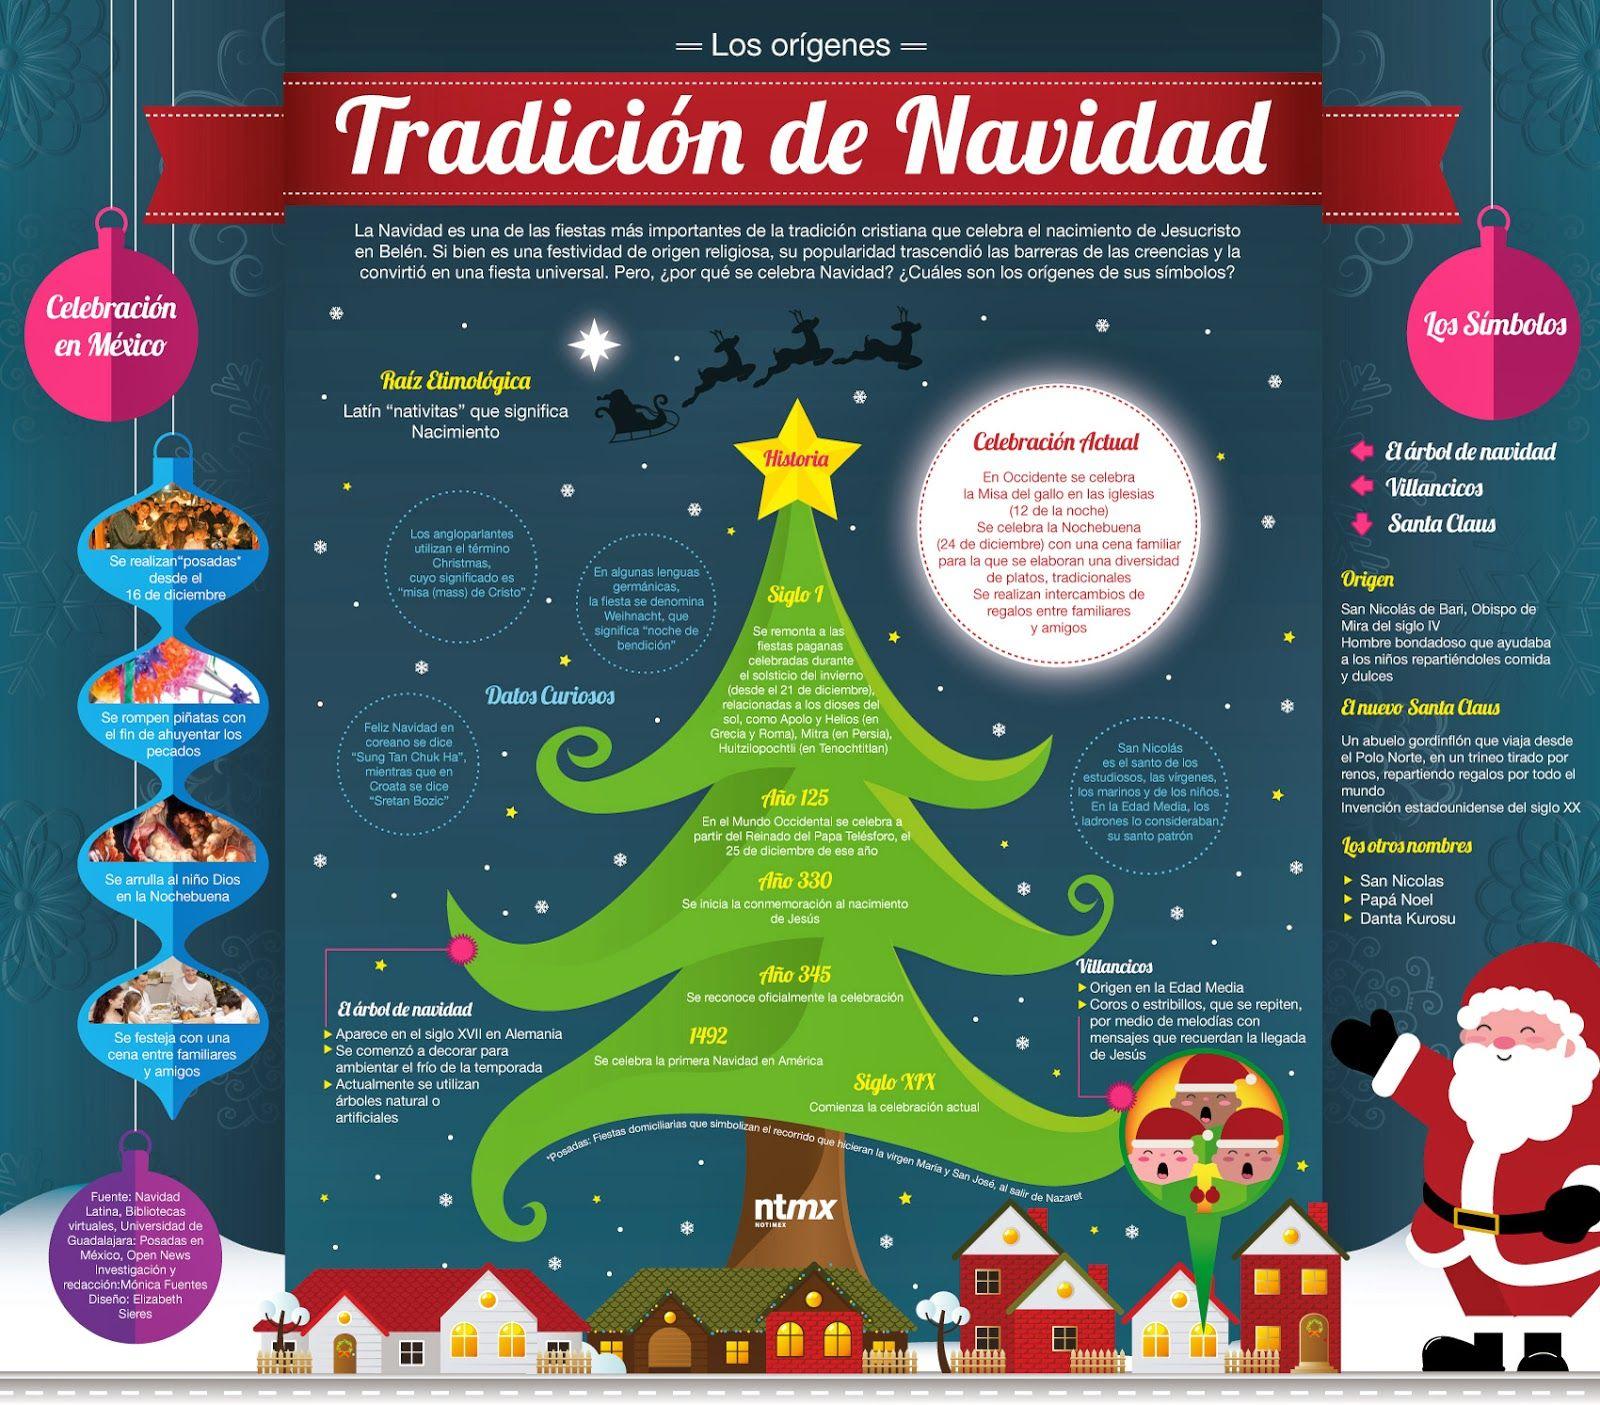 Los Origenes De La Tradicion De La Navidad Infografia